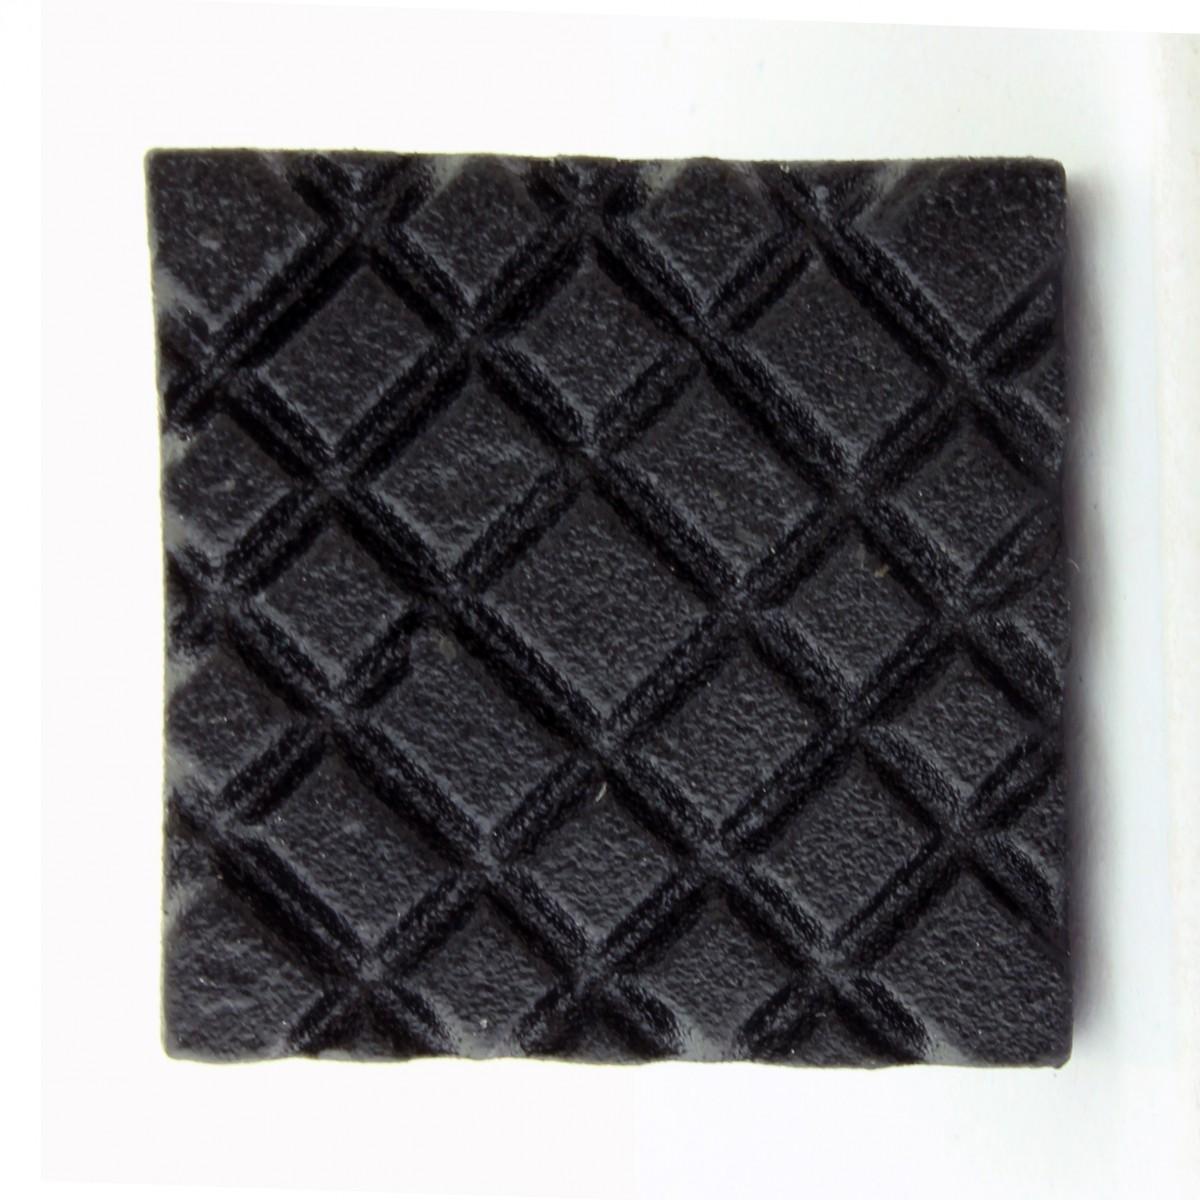 Square Diamond Grid Iron Cabinet Knob Black Pack of 2 Cabinet Knob Iron Cabinet Knob Cabinet Knob Black